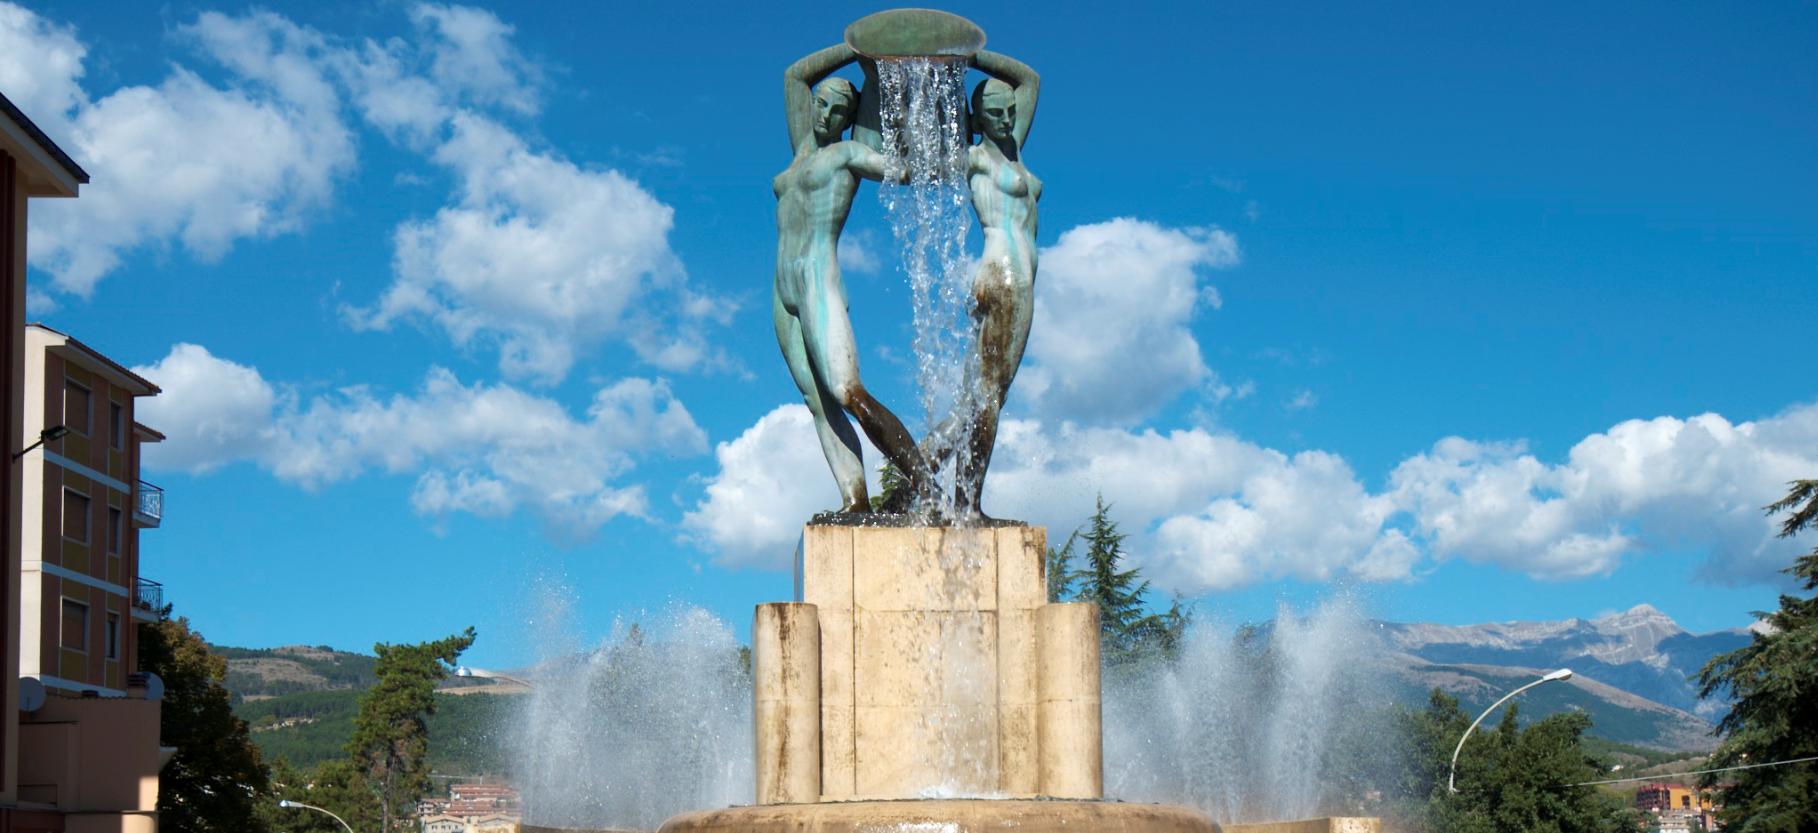 The Luminous Fountain